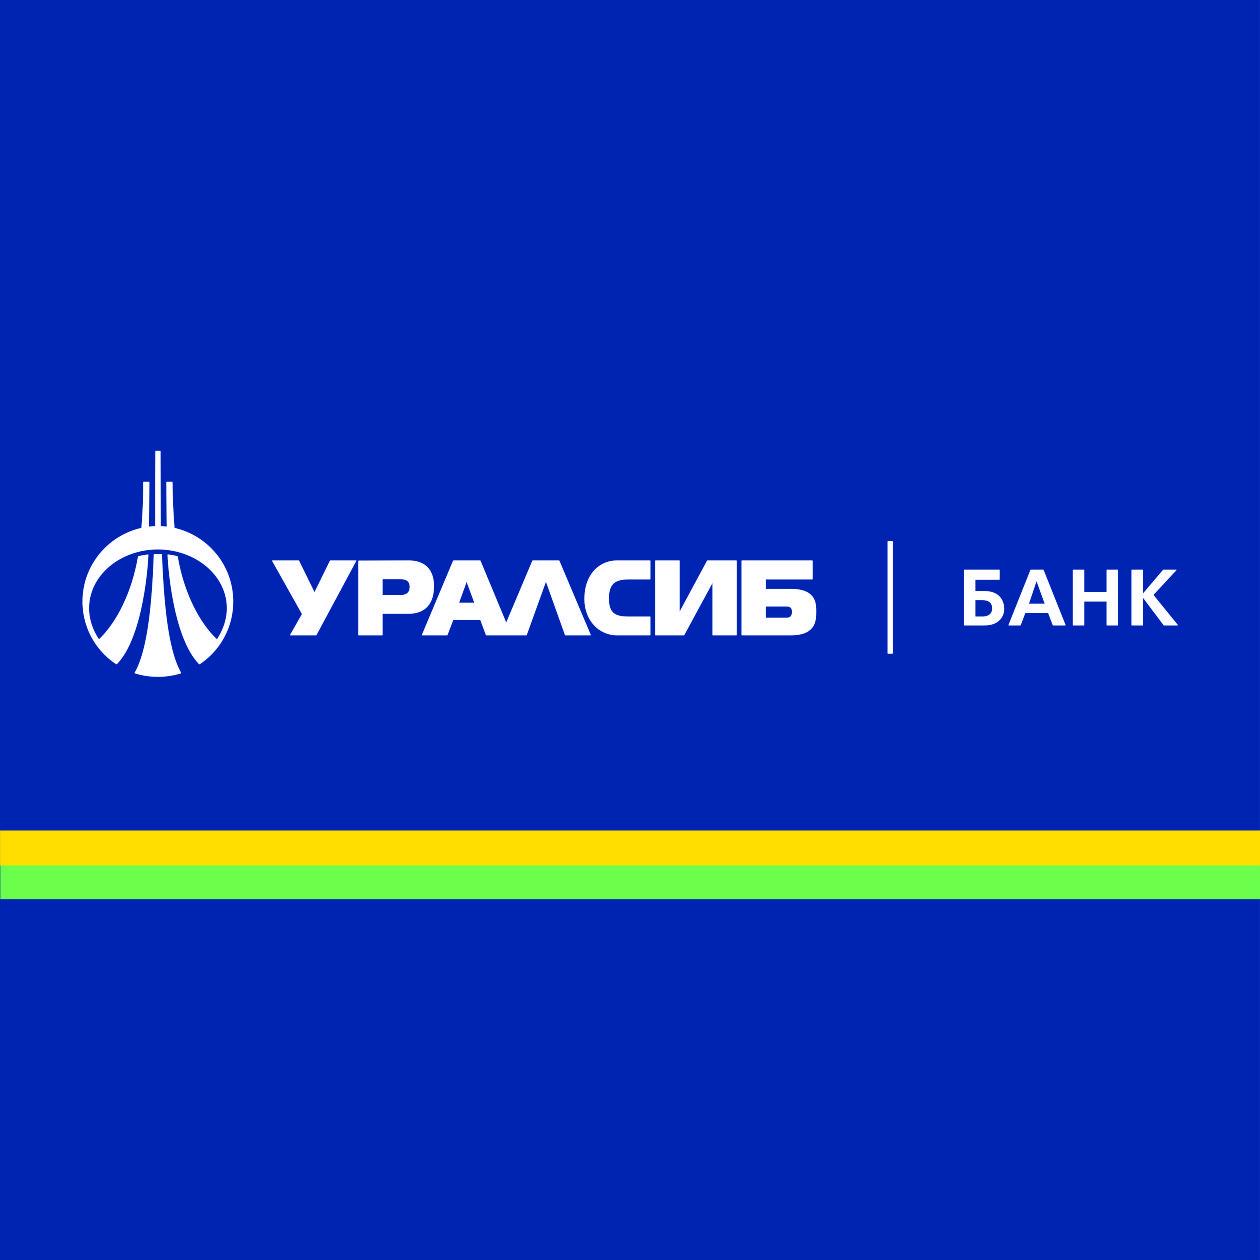 Университет бизнеса Банка УРАЛСИБ подвел итоги 2019 года